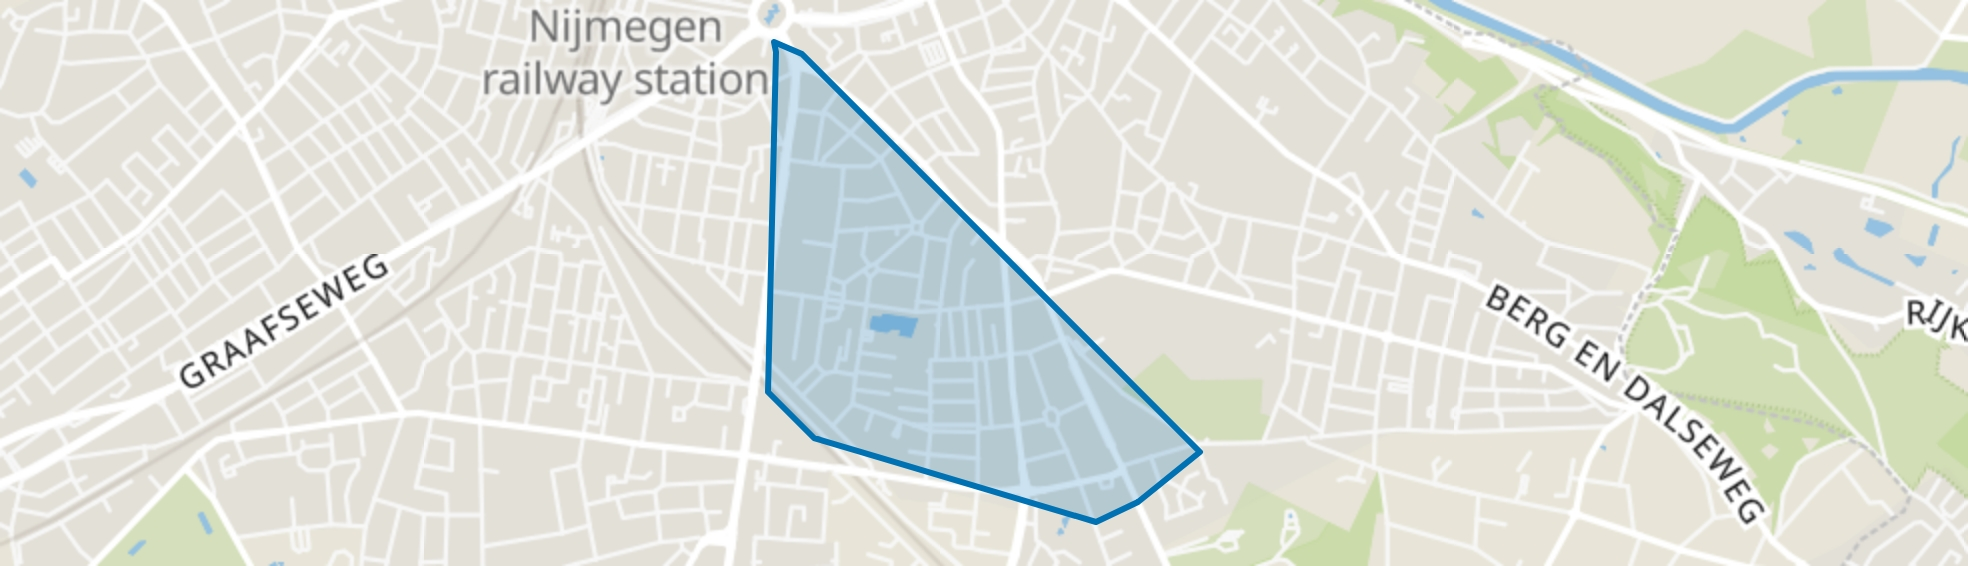 Galgenveld, Nijmegen map